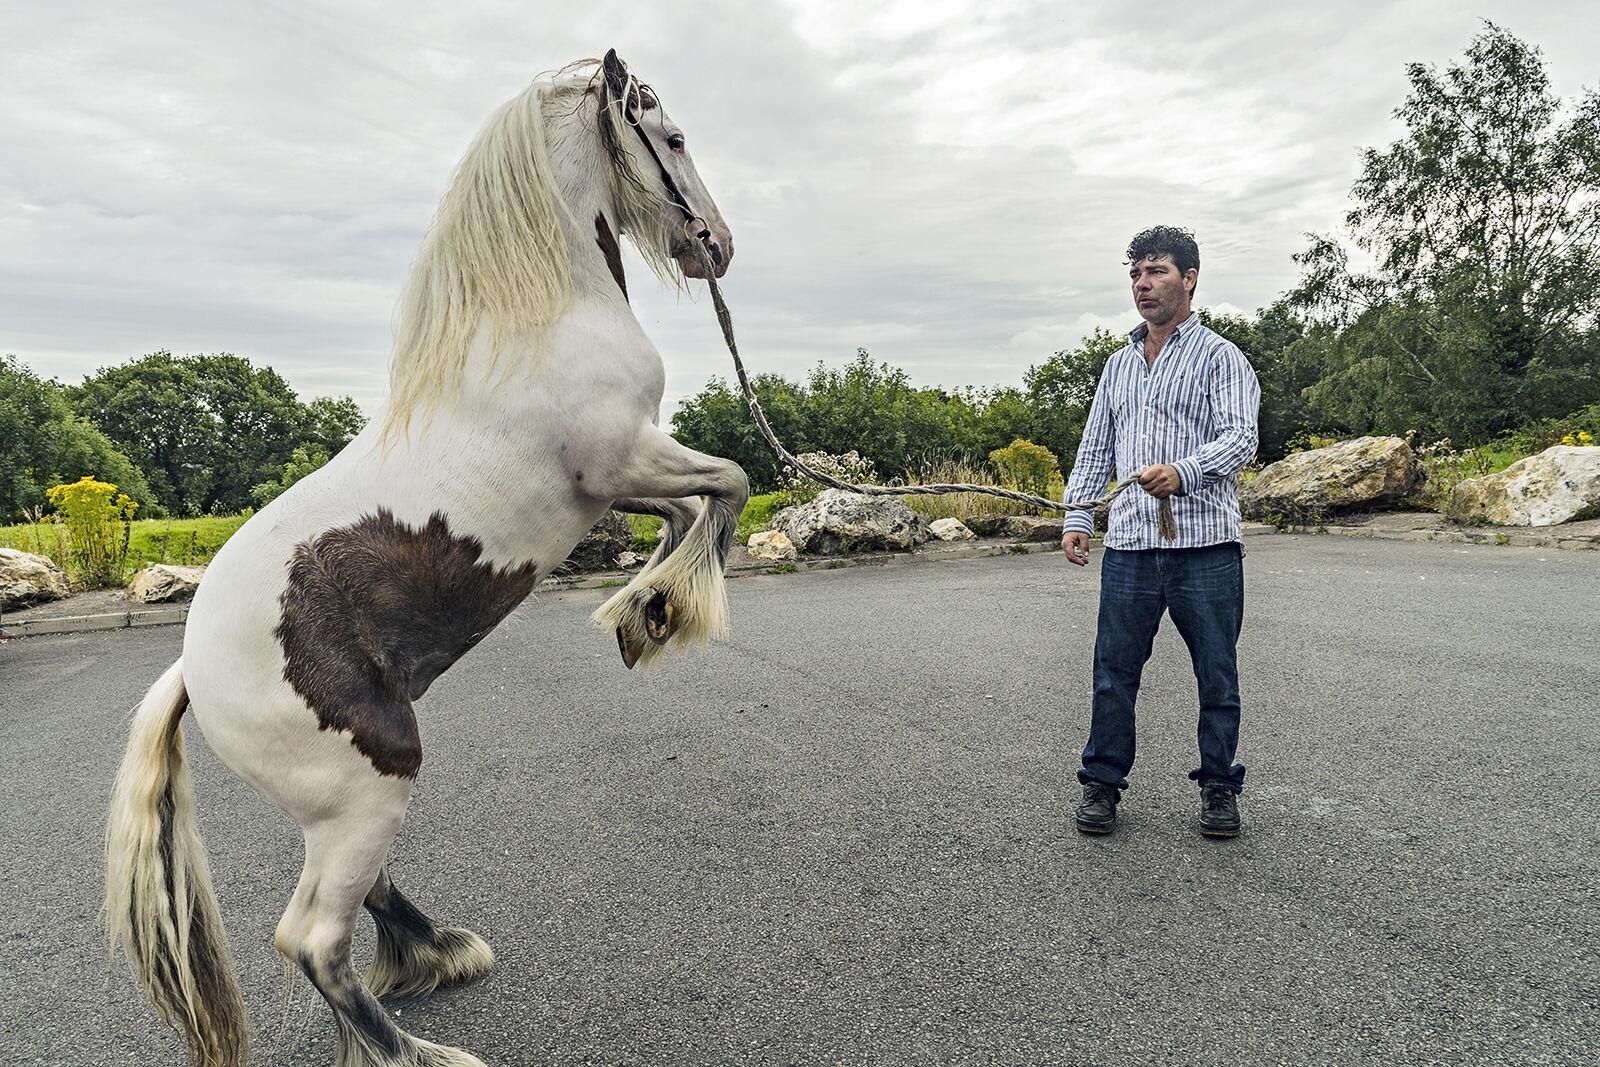 Rearing Pony, Wexford, Ireland 2019